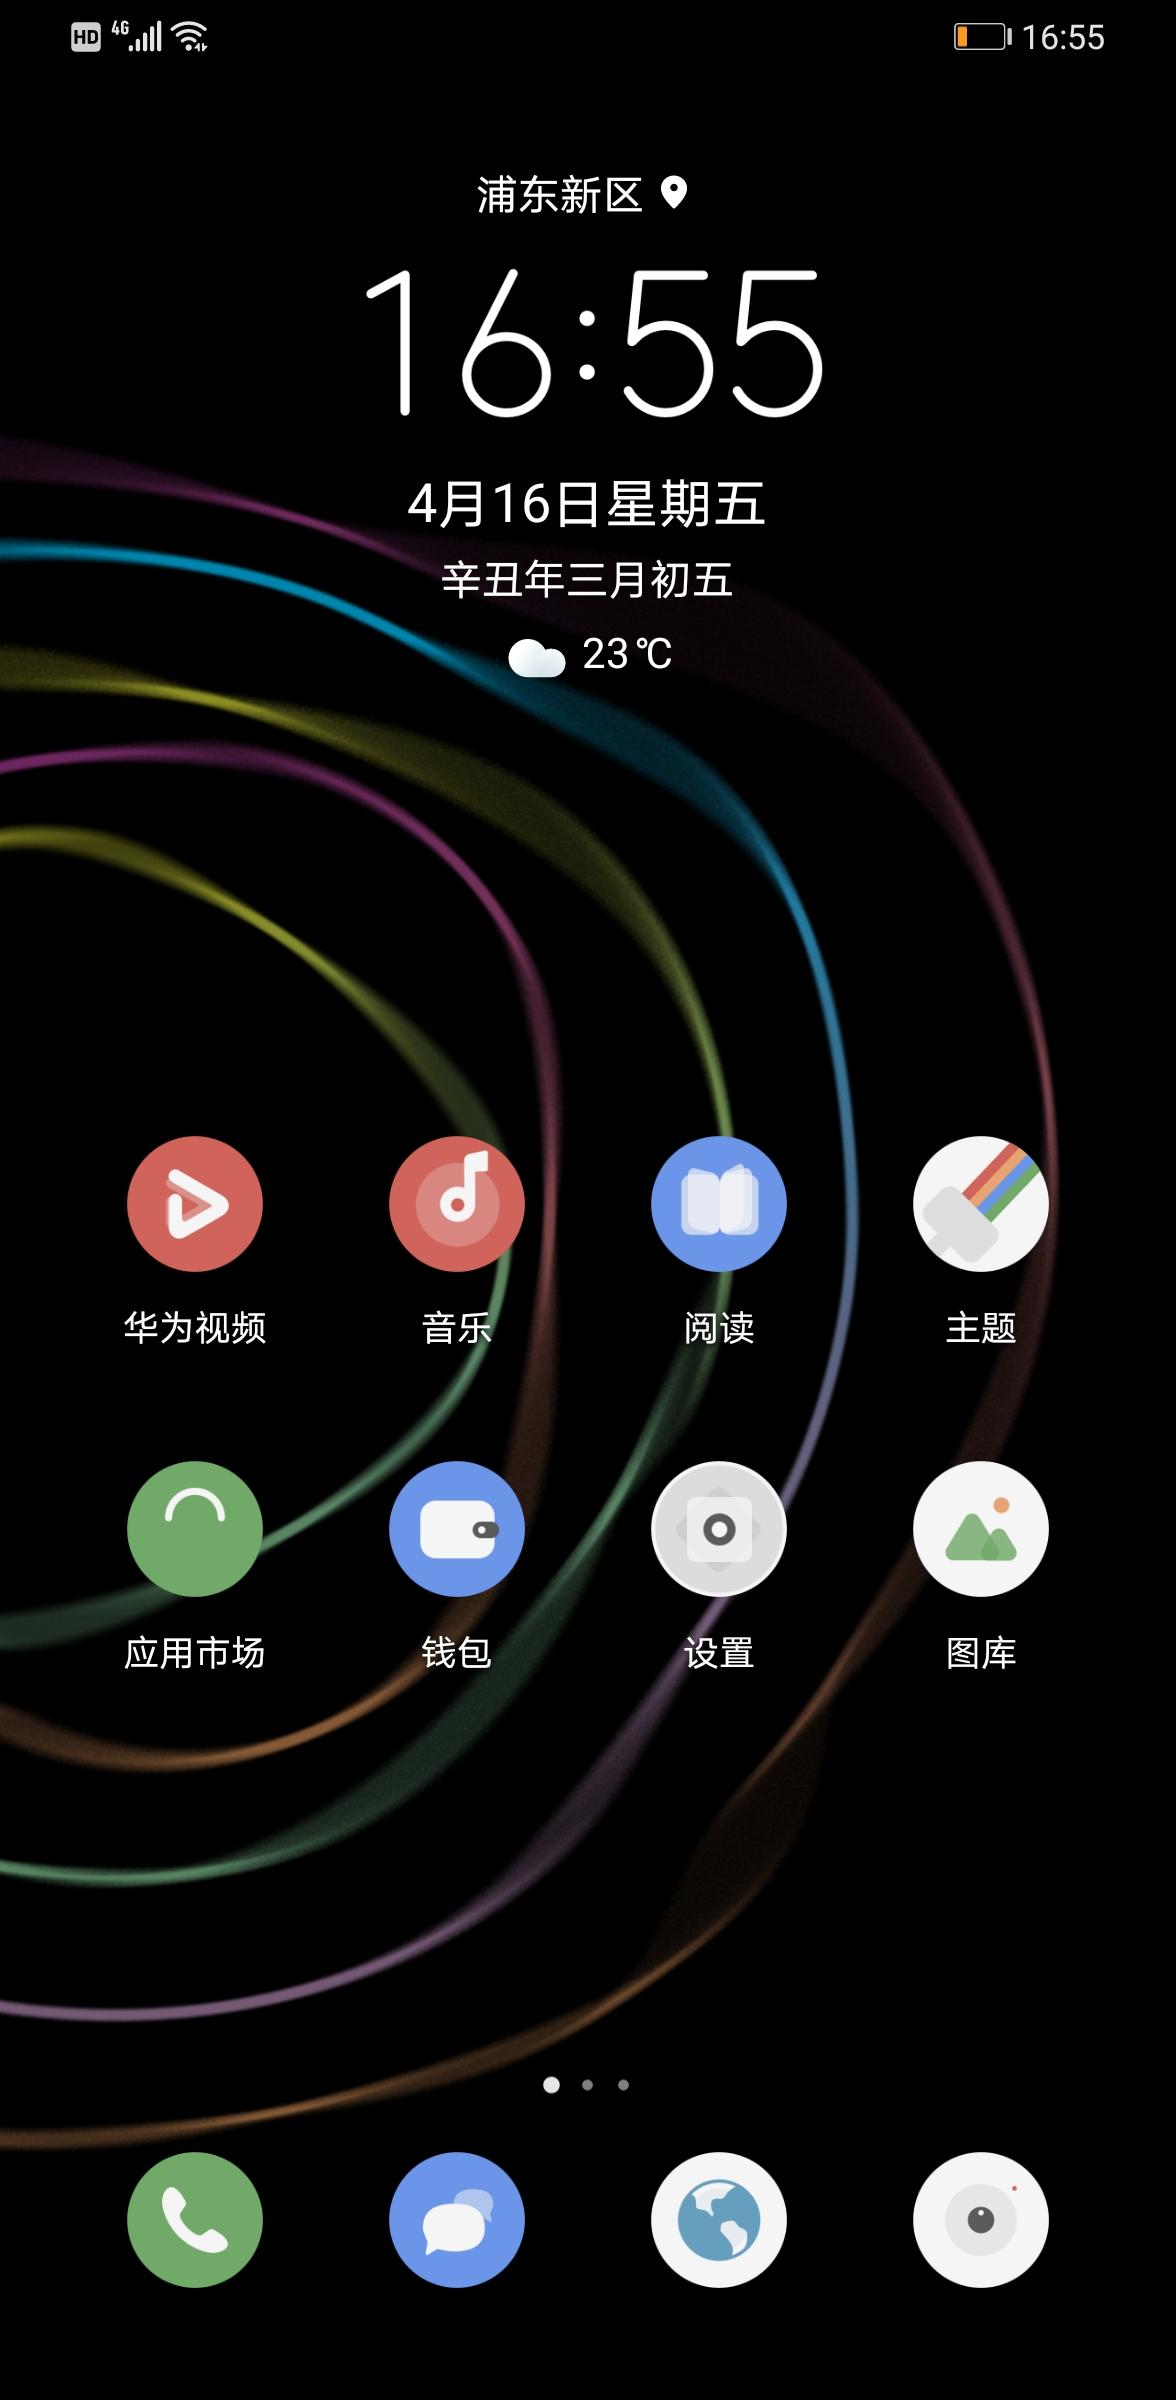 Screenshot_20210416_165524_com.huawei.android.lau.jpg